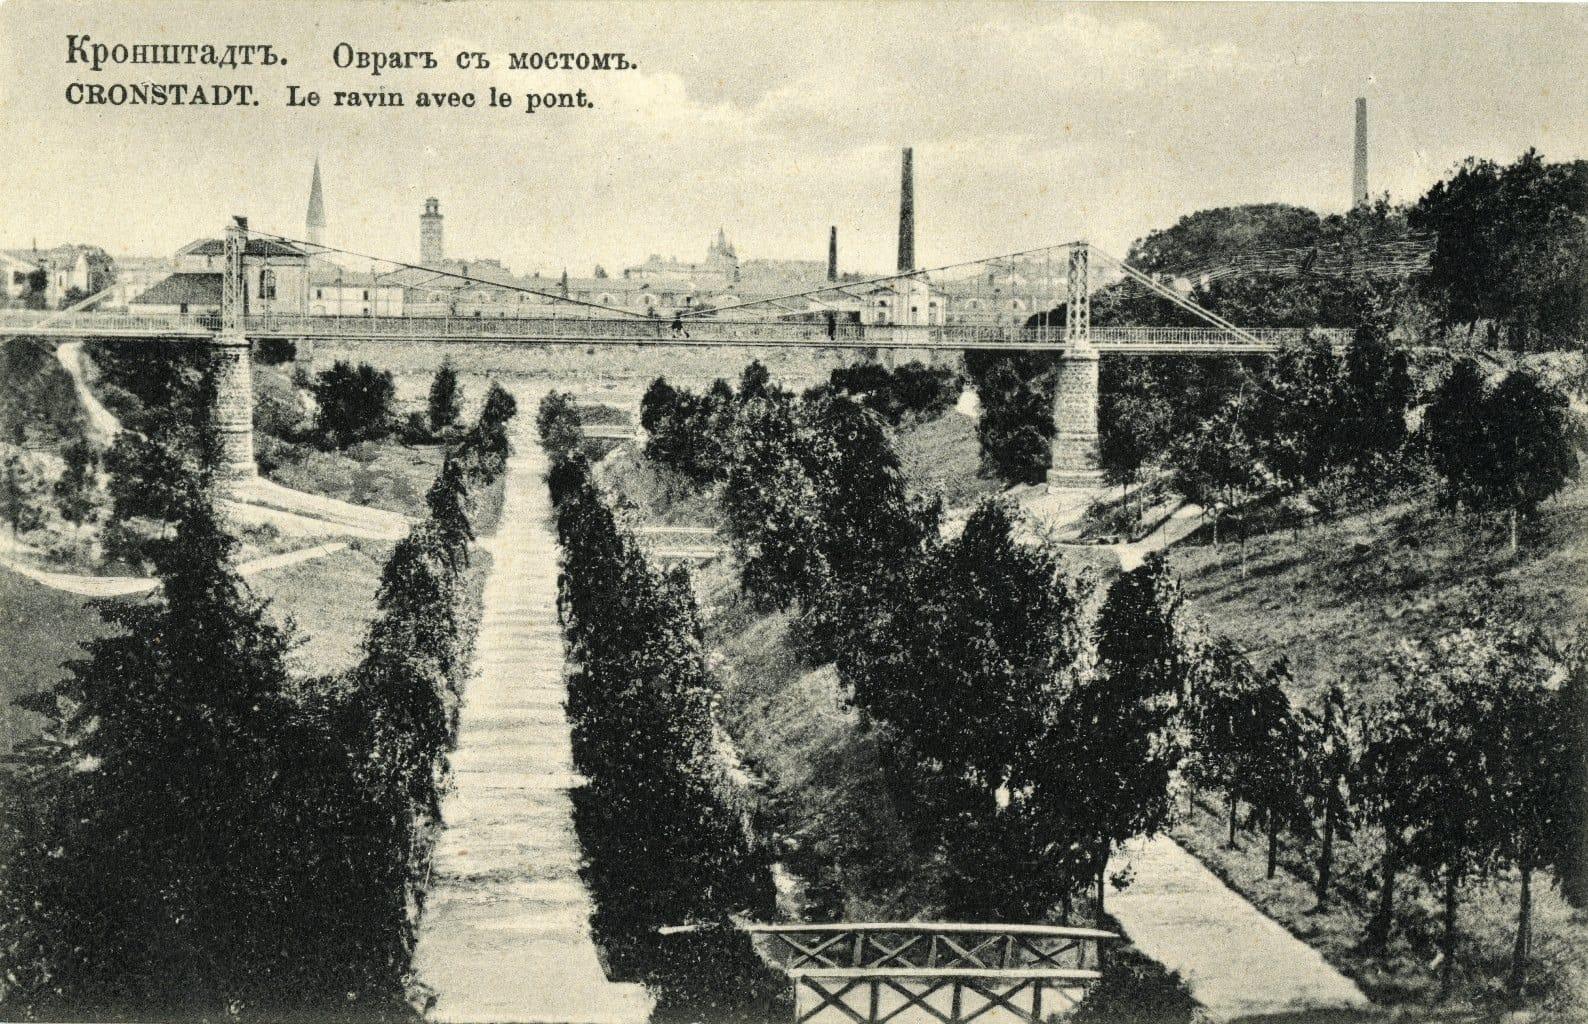 Овраг с мостом, Кронштадт 1913-1916 гг